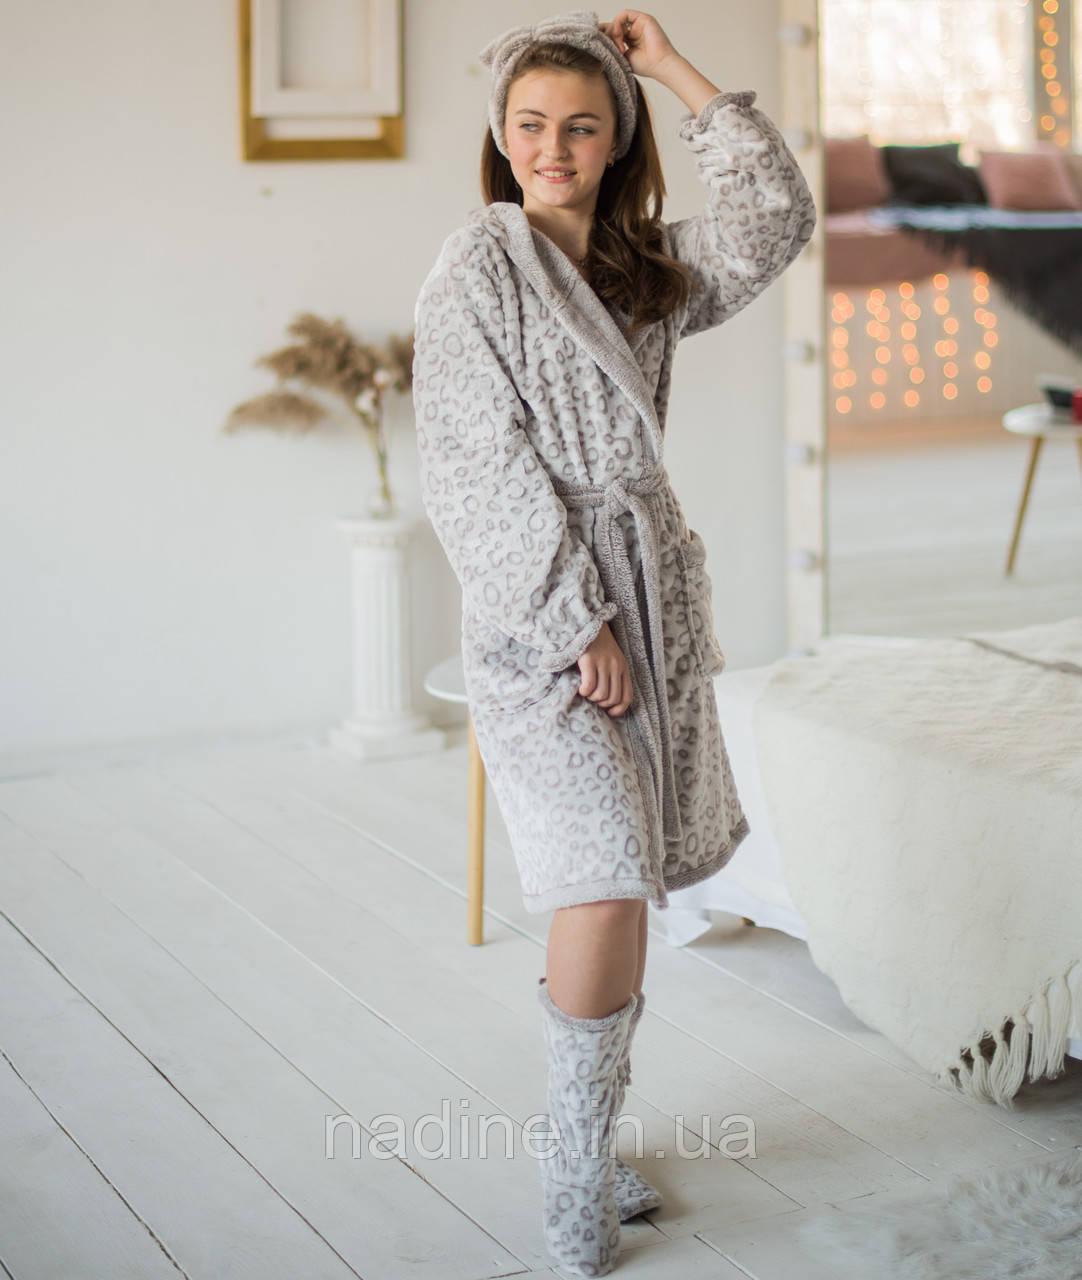 Халат Cream подростковый Eirena Nadine (455-64) рост 158-164 бежевый + сапожки